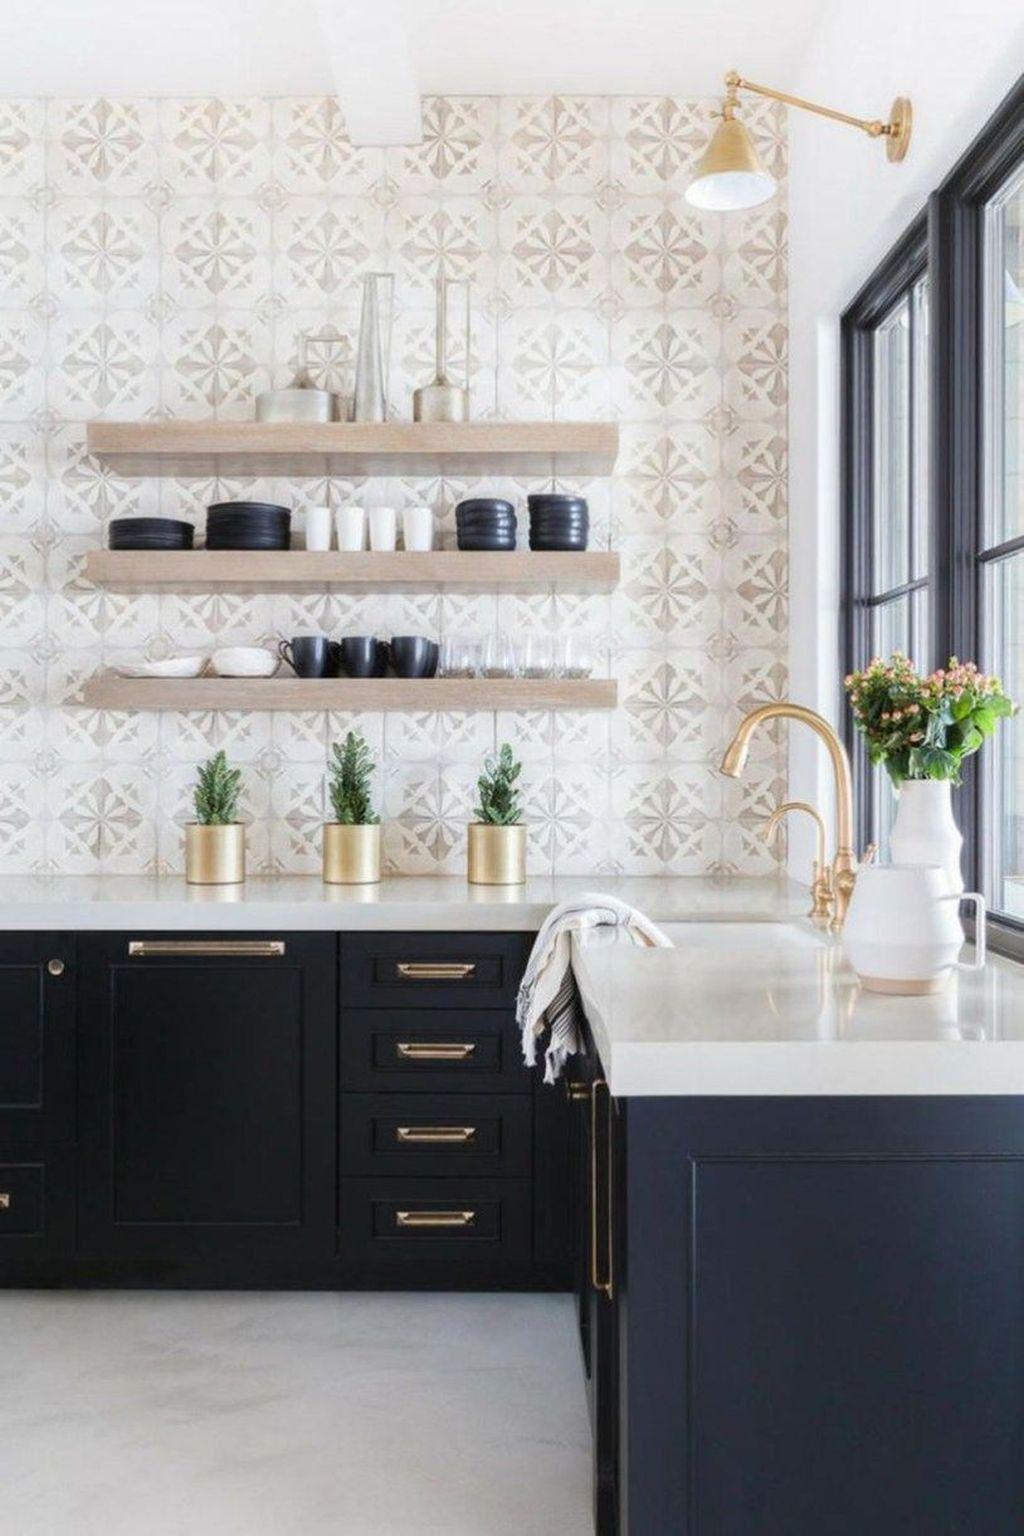 Farmhouse Style Kitchen Backsplash Best Home Style Inspiration